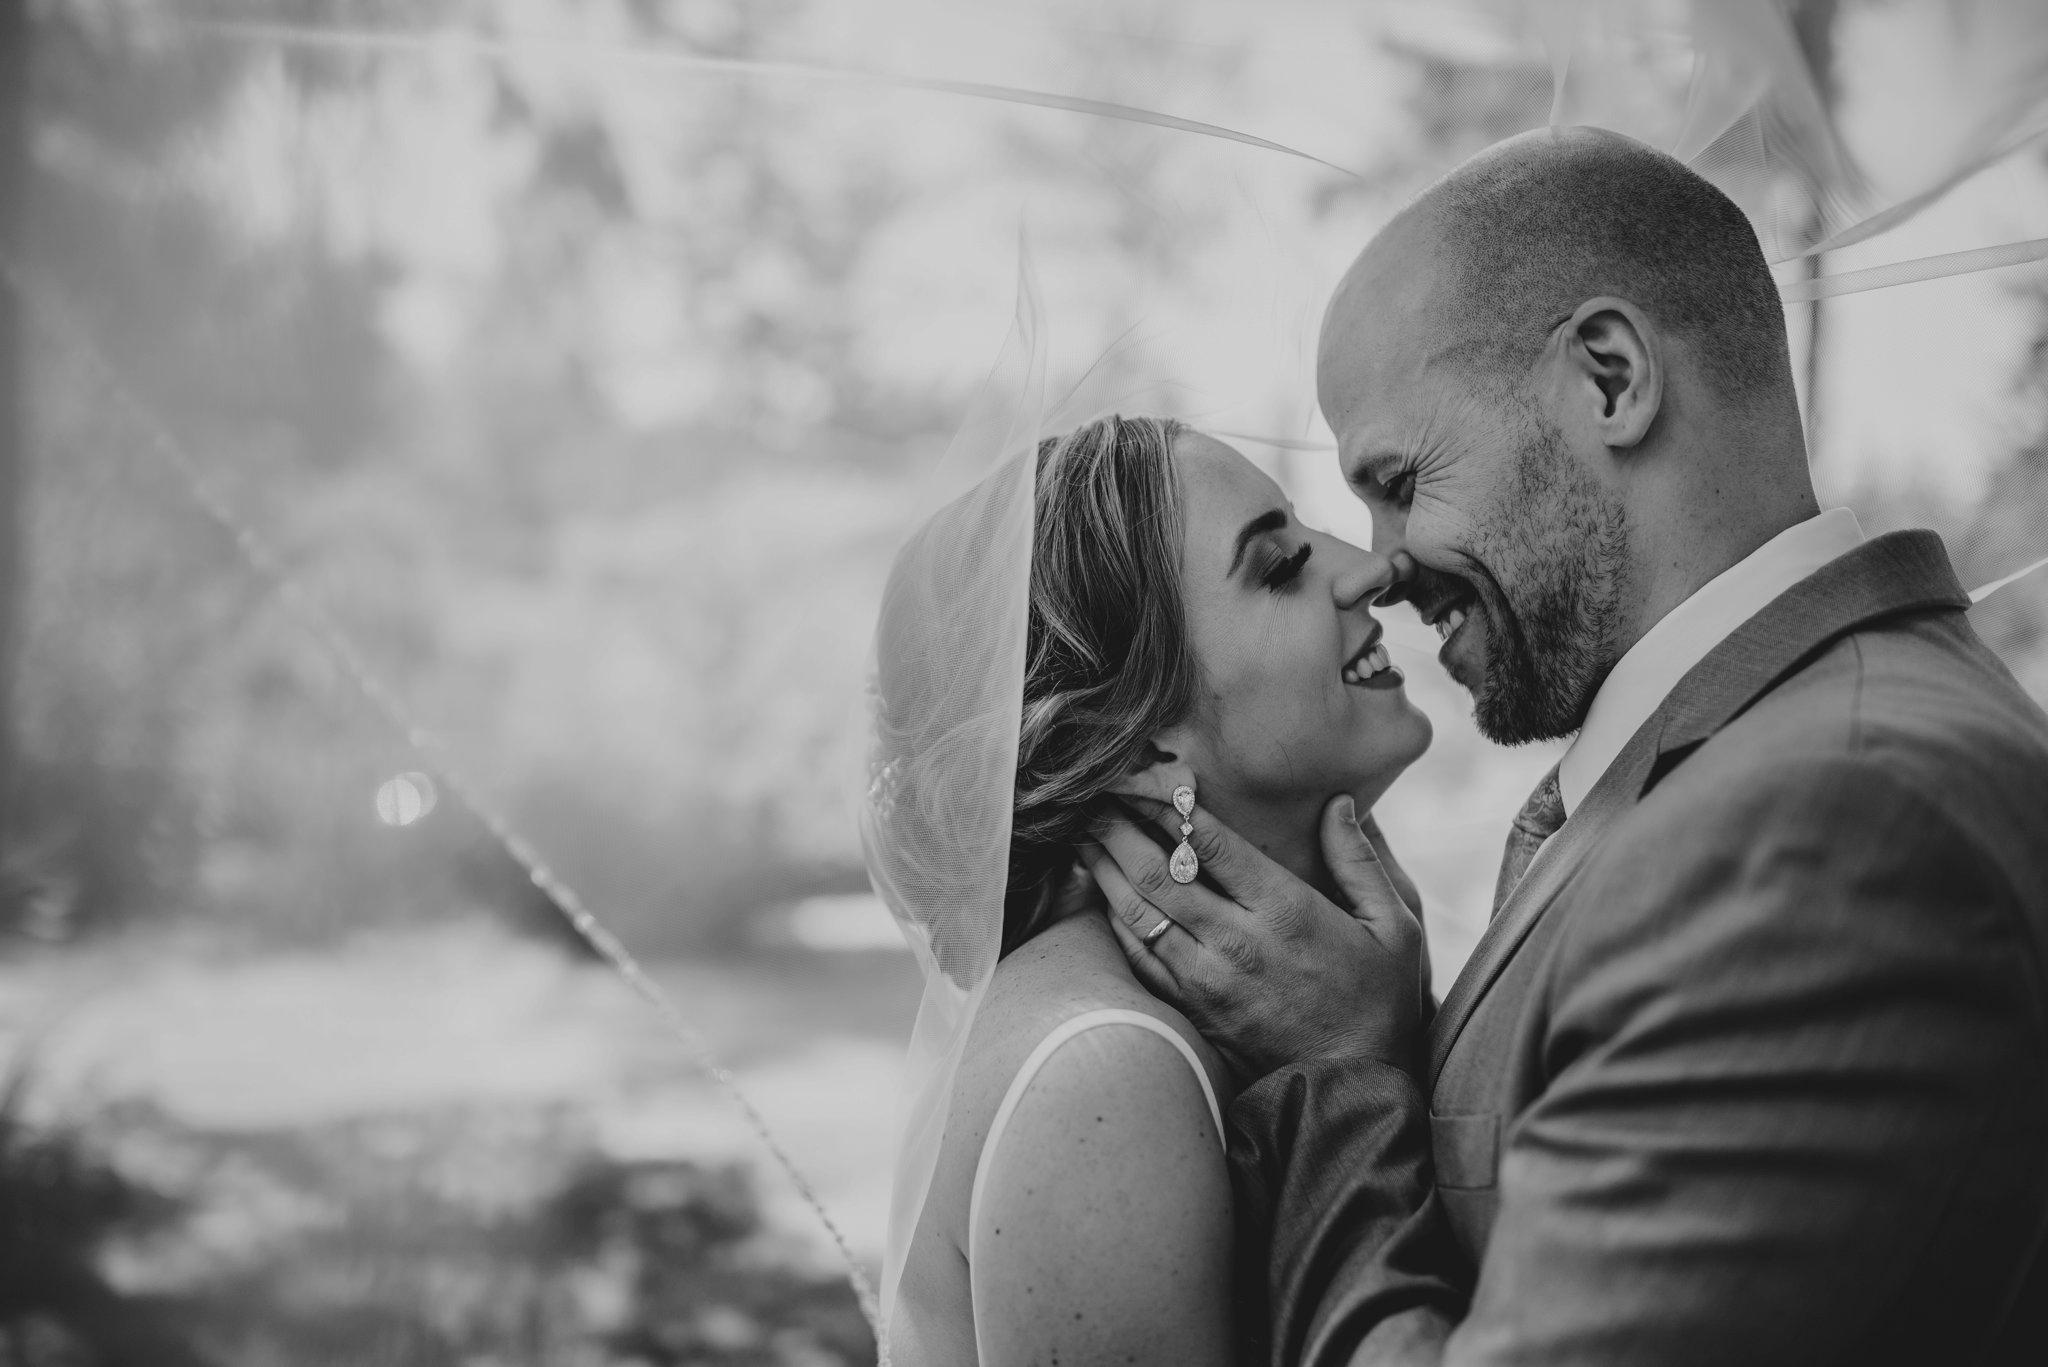 hollywood-school-house-wedding-seattle-photographer-caitlyn-nikula-45.jpg